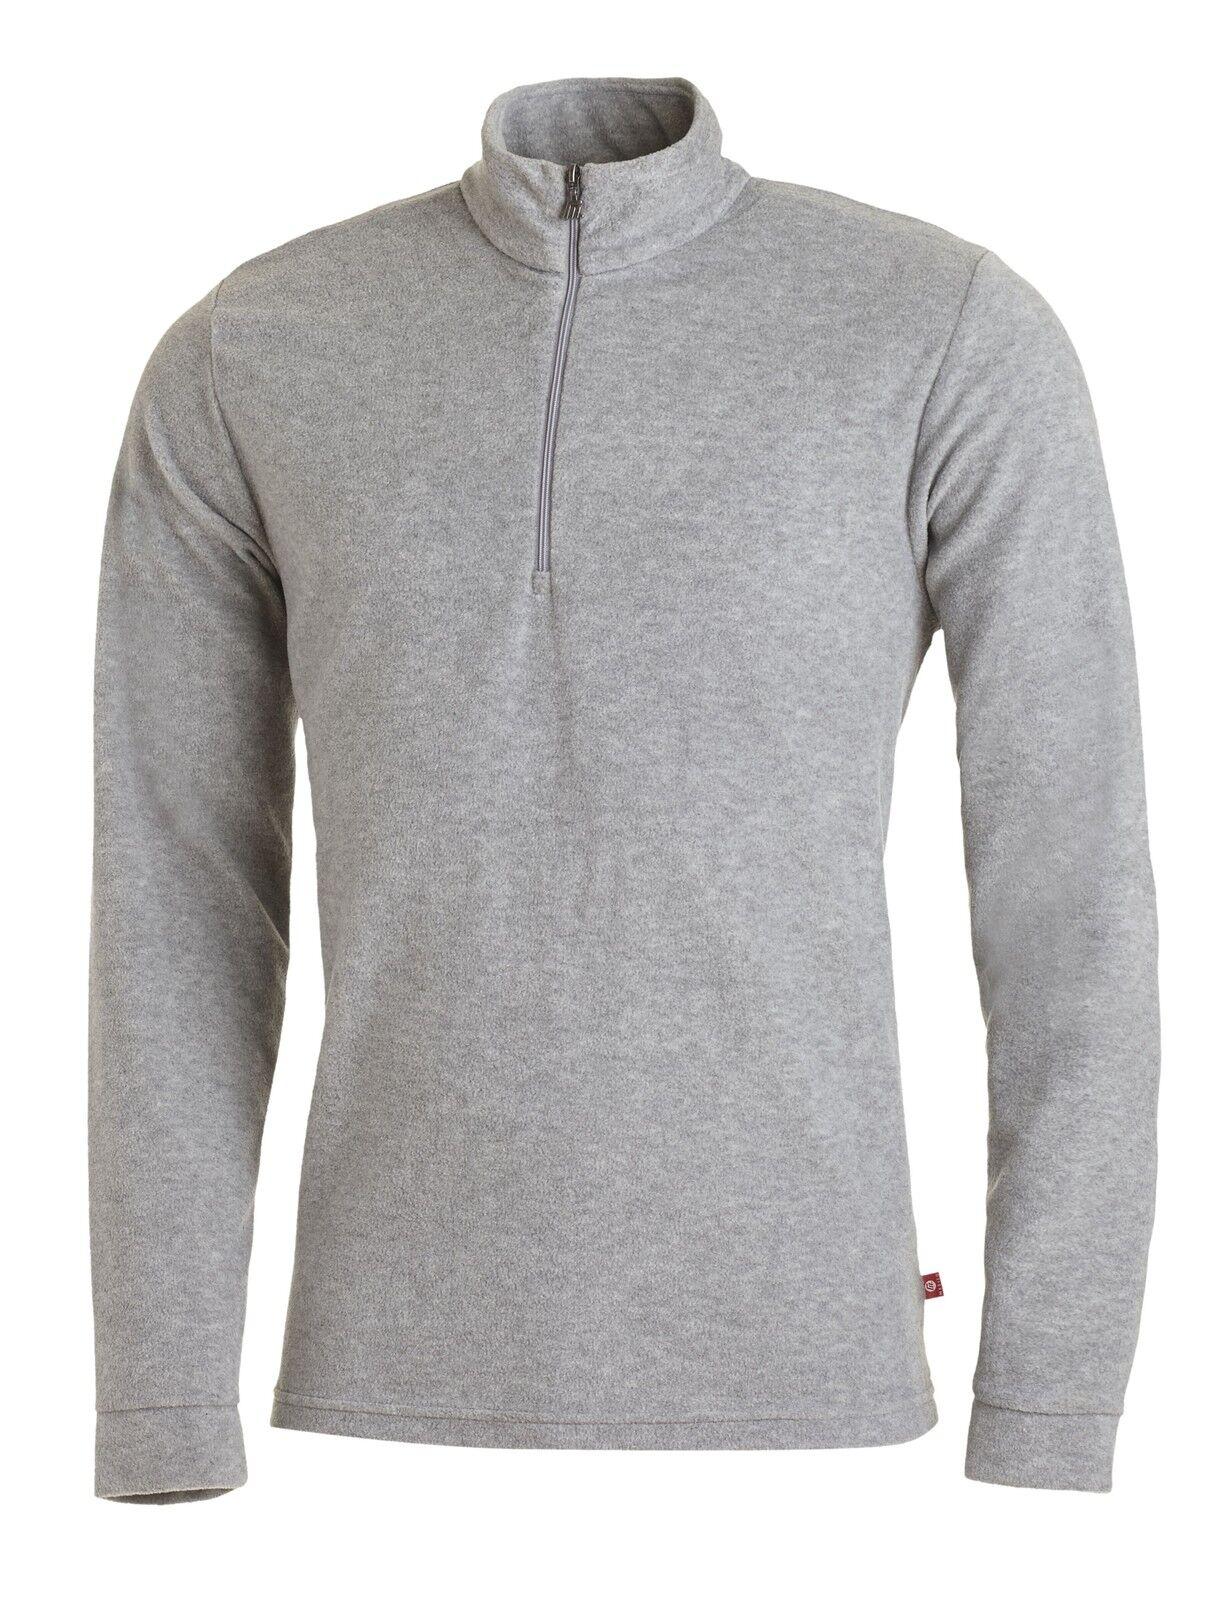 Medico Herren Ski Shirt Fleece Pullover Rolli langarm mit Zipper Grau